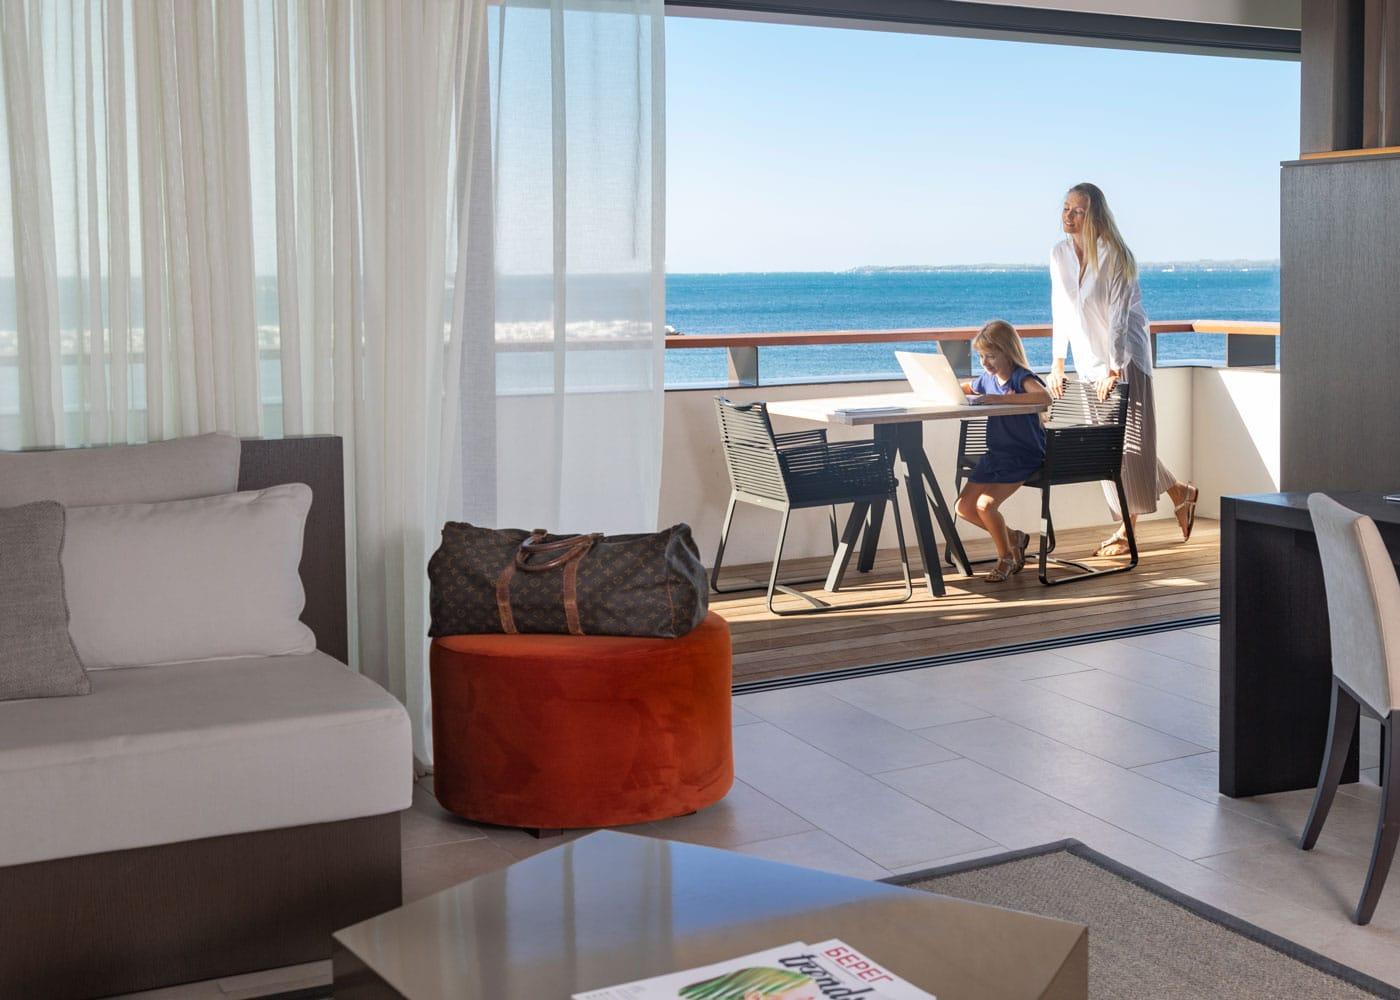 Cap-Antibes-Beach-Hotel-Open-window_endless-sea-view